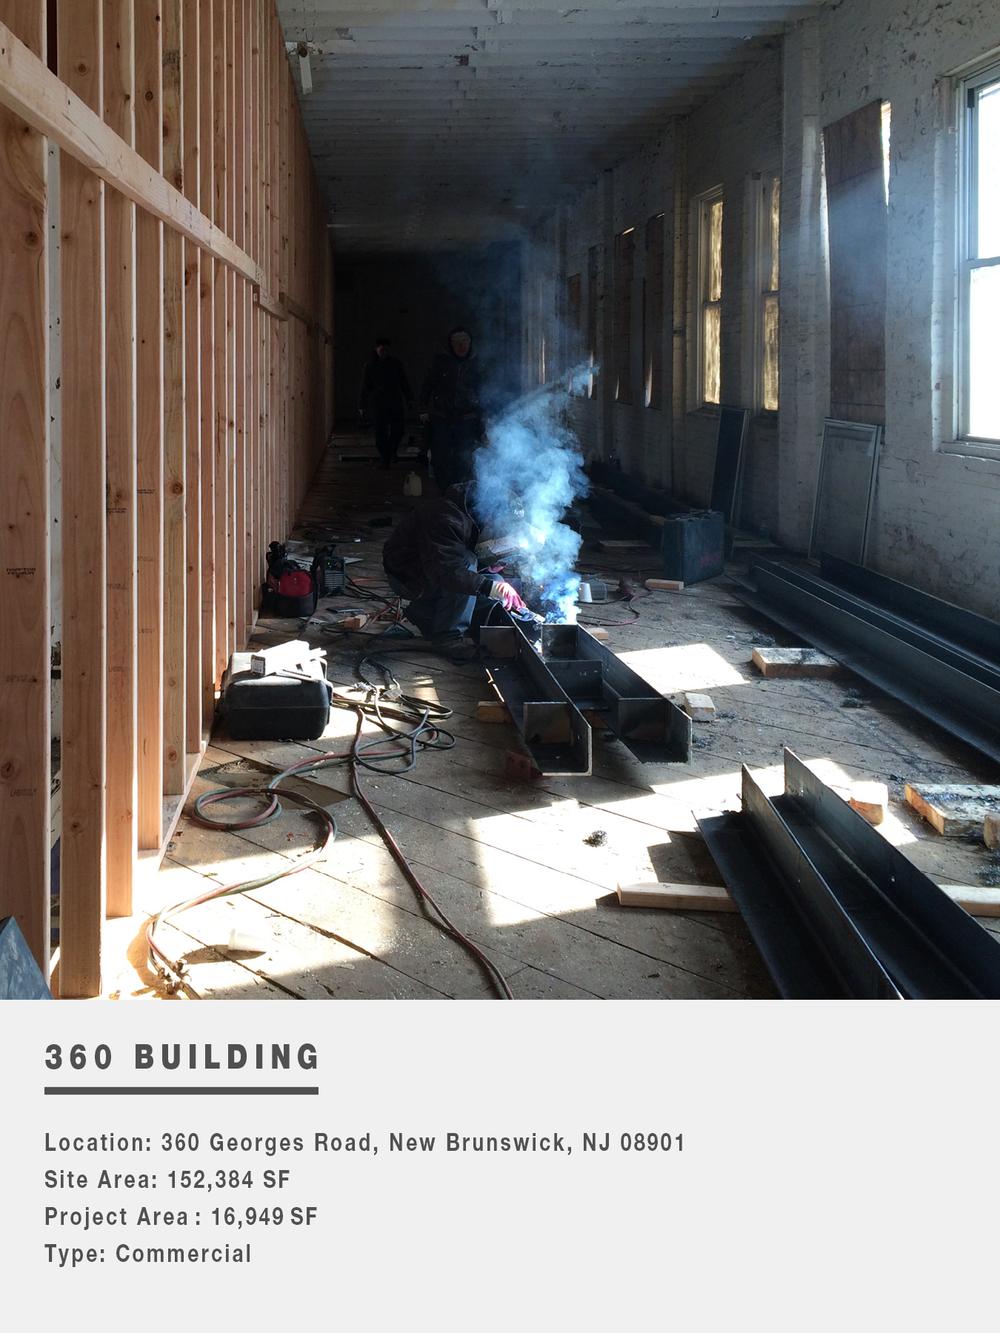 360 BUILDING